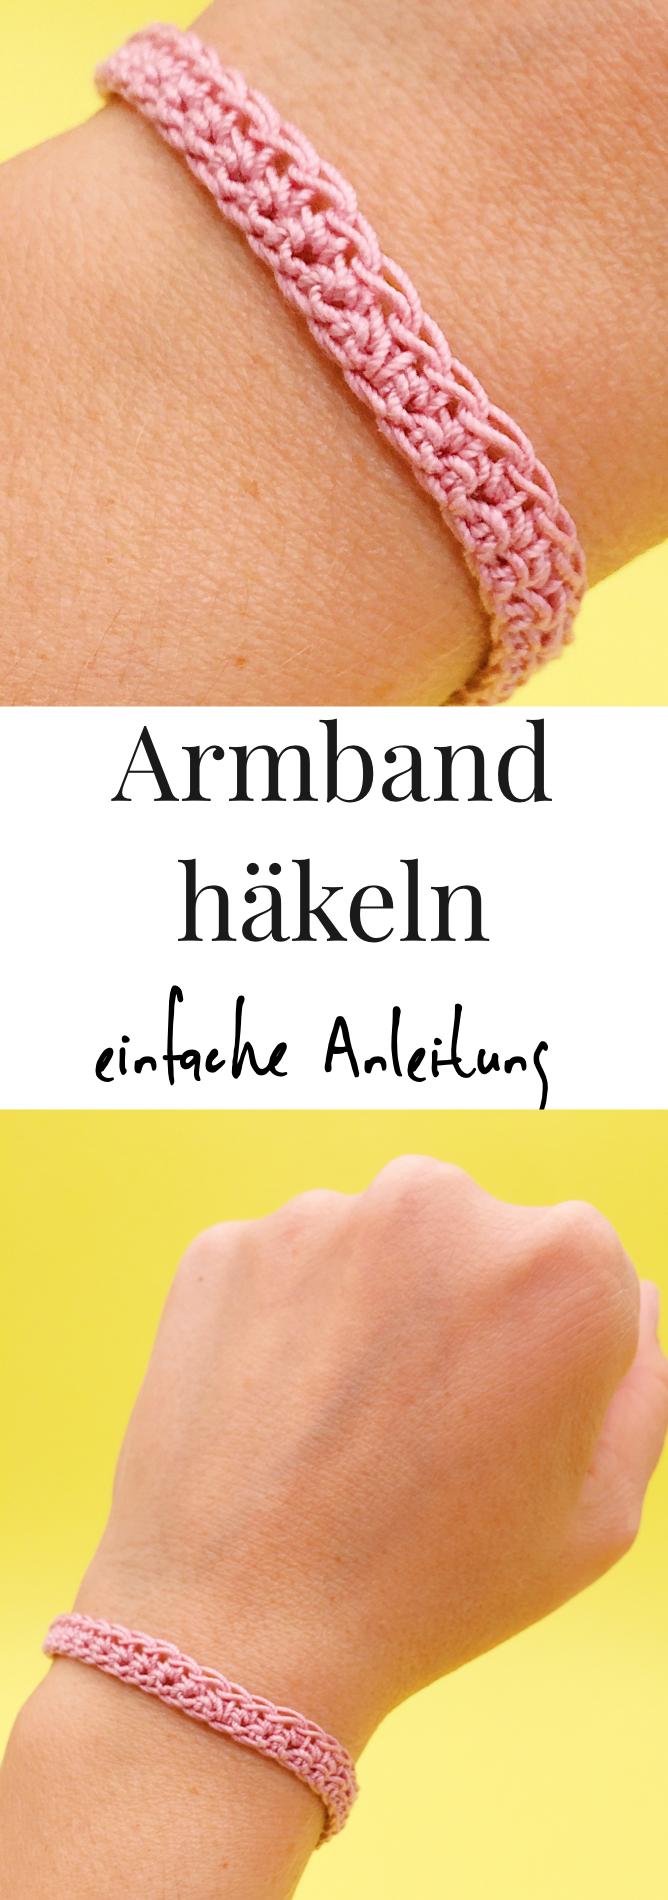 Photo of Armbänder selber machen